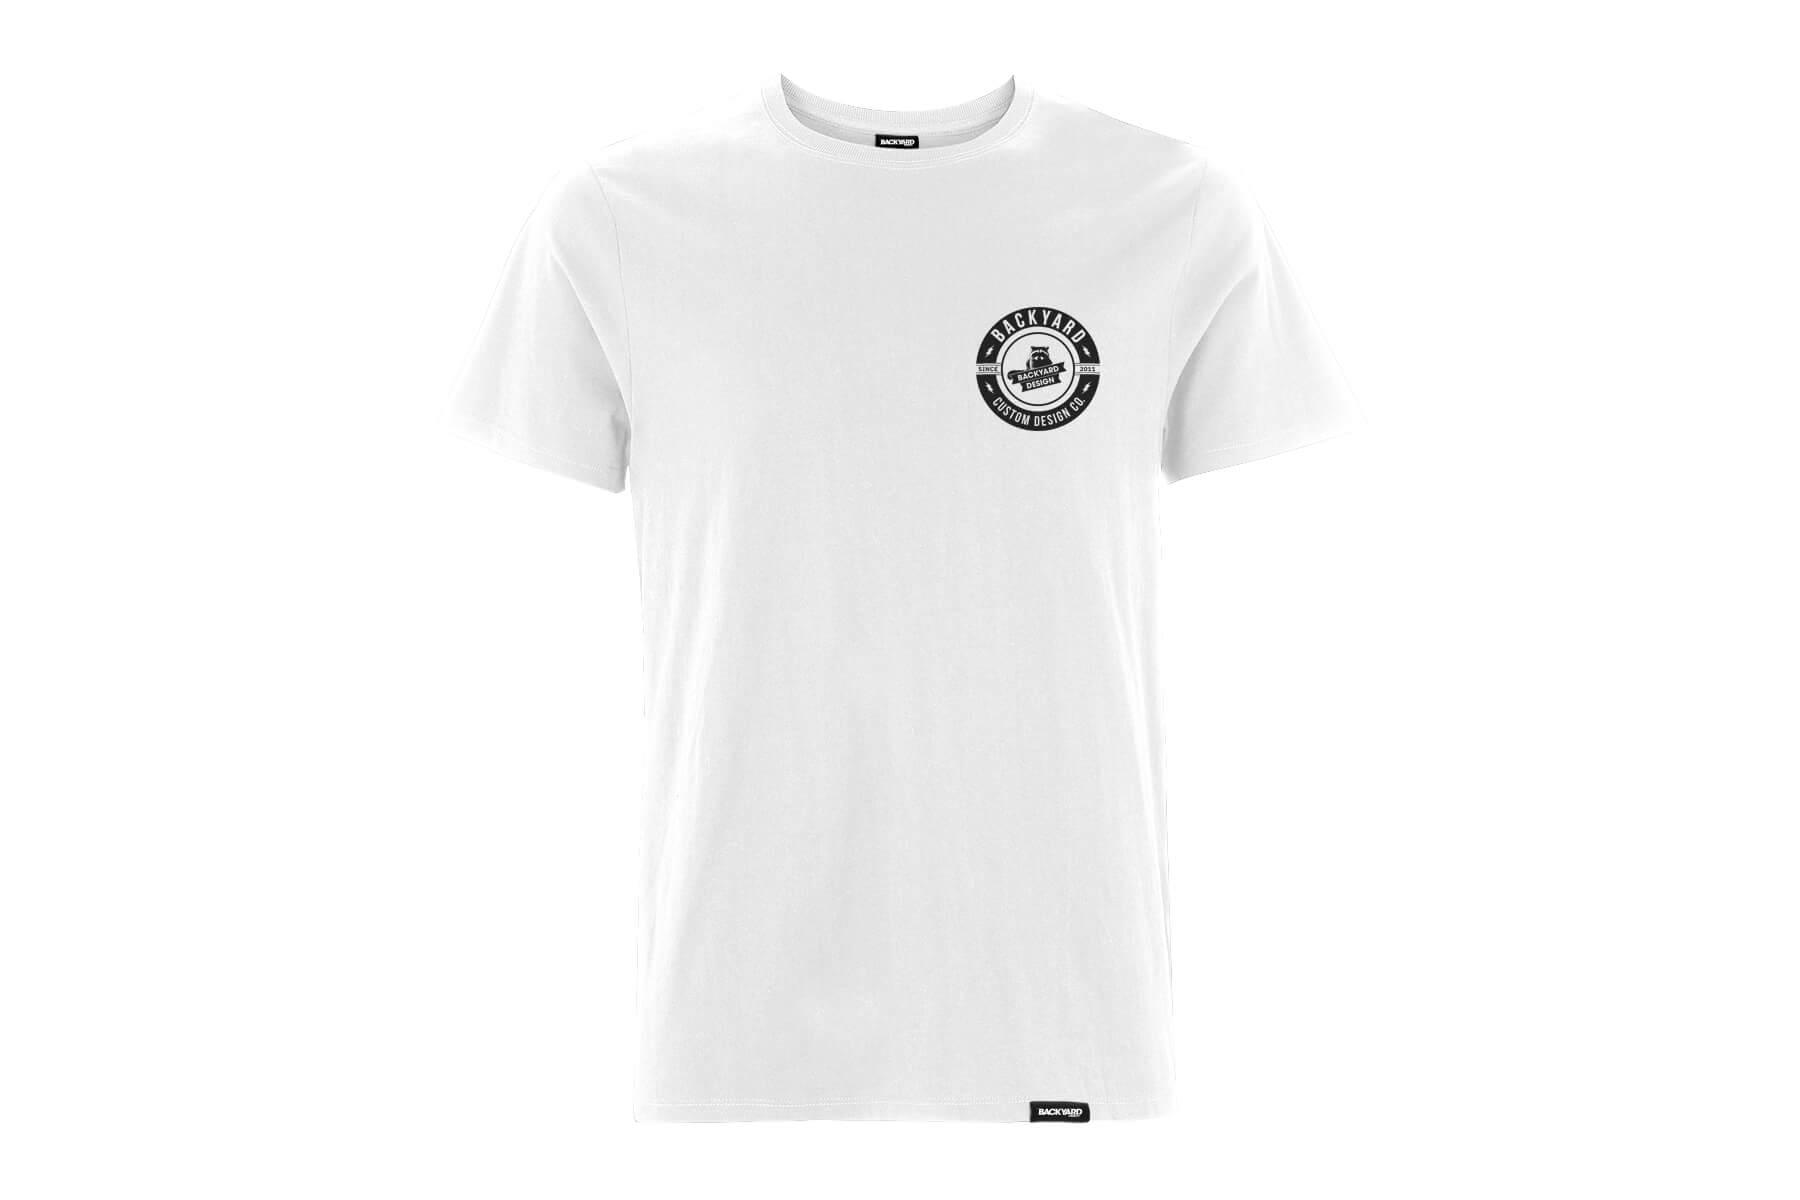 Backyard Design T Shirt Circle Logo Weiss White Back BYD Clothing Motocross MX Tee